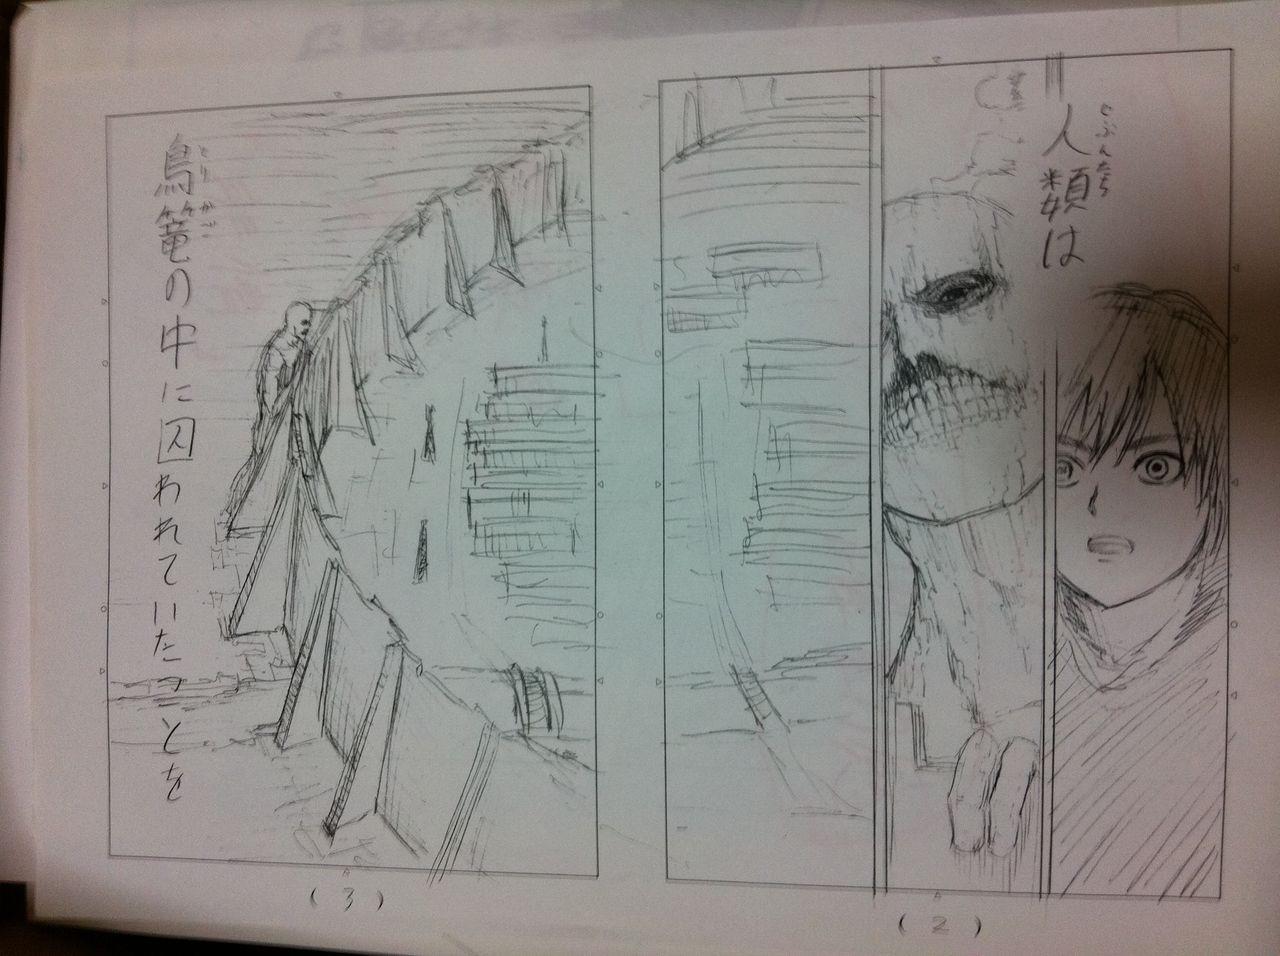 http://blog-imgs-61.fc2.com/k/y/a/kyarasokuhou/jNsHEDB.jpg